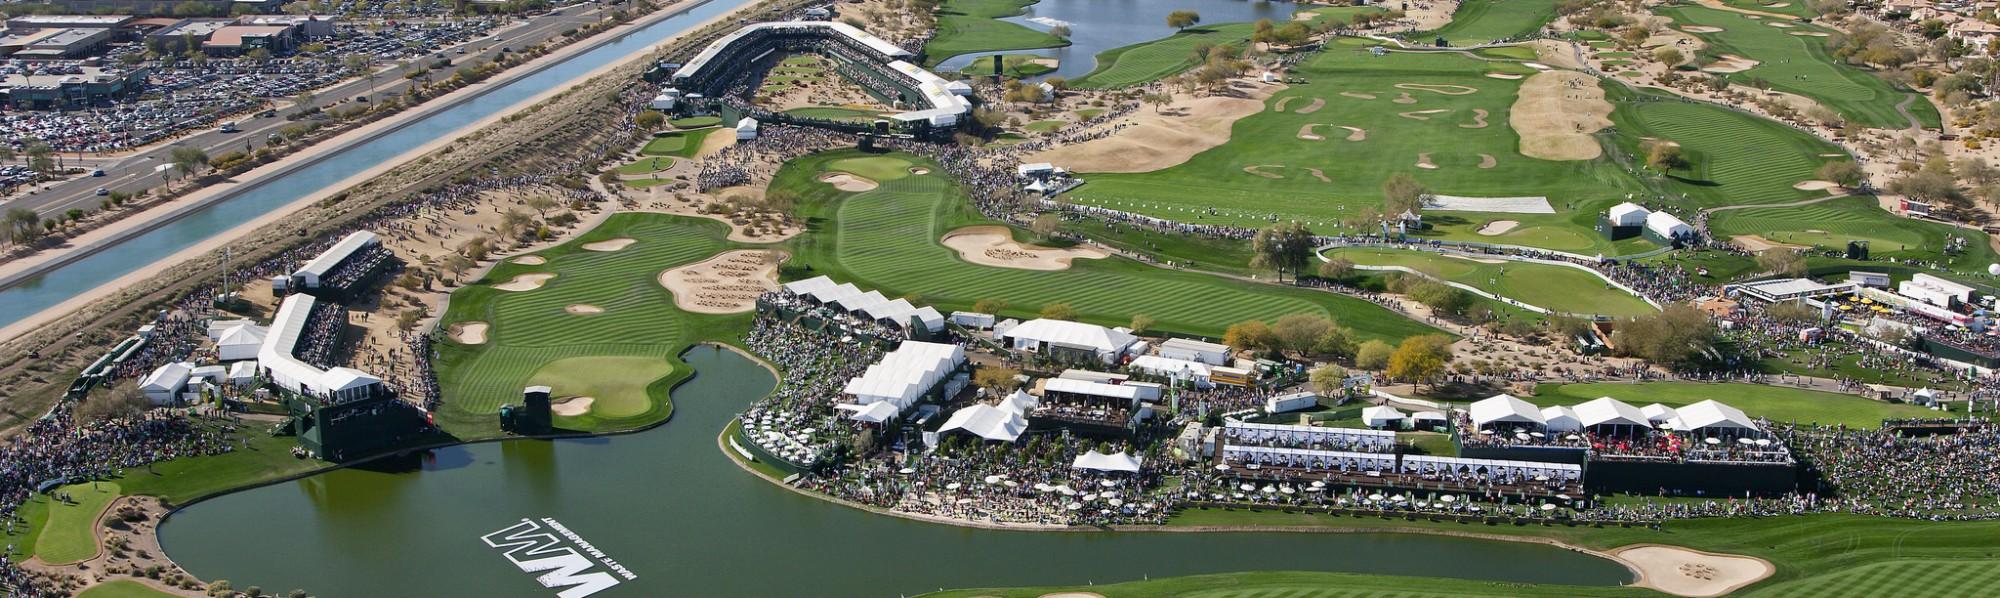 Phoenix Open Golf